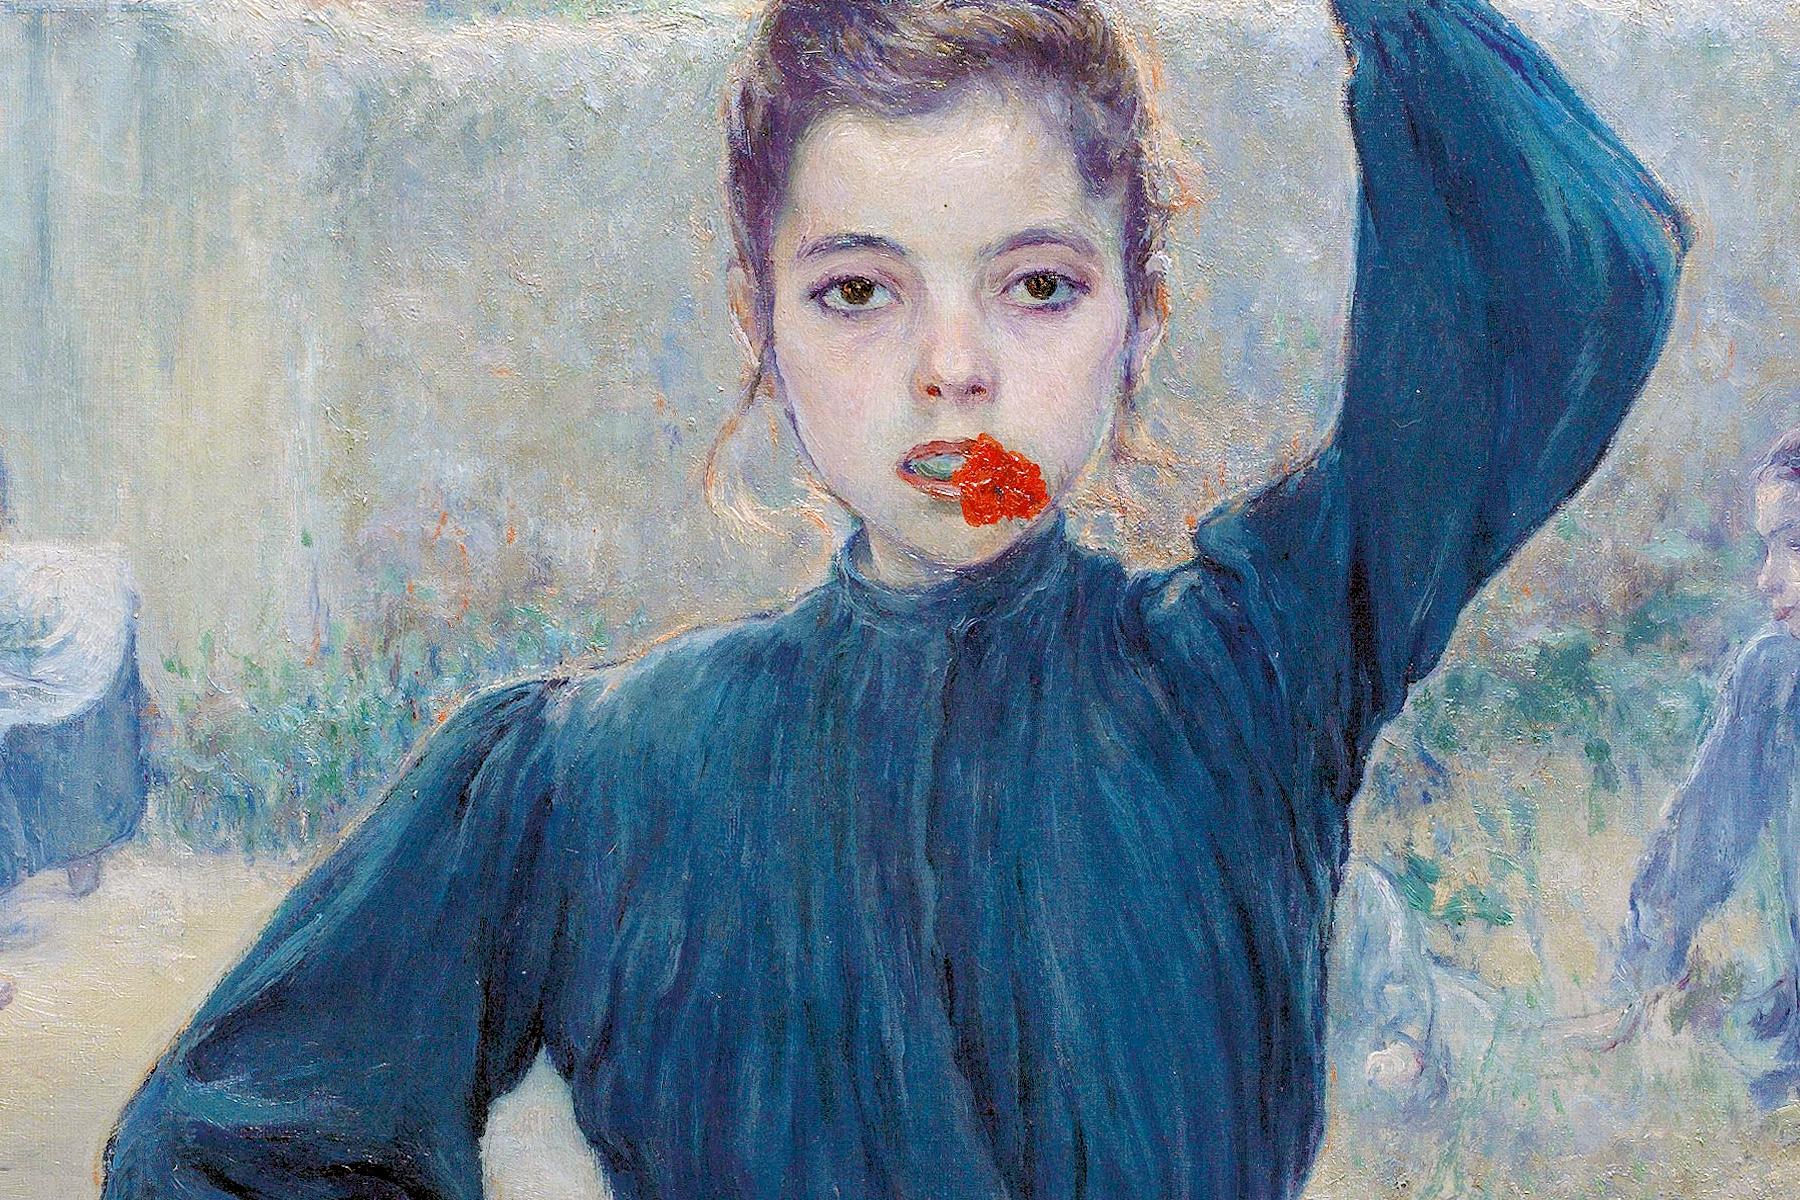 Adolfo Guiard (Bilbao, 1860 - Bilbao, 1916). La aldeanita del clavel rojo, 1903. Óleo sobre lienzo, 73 x 60 cm.